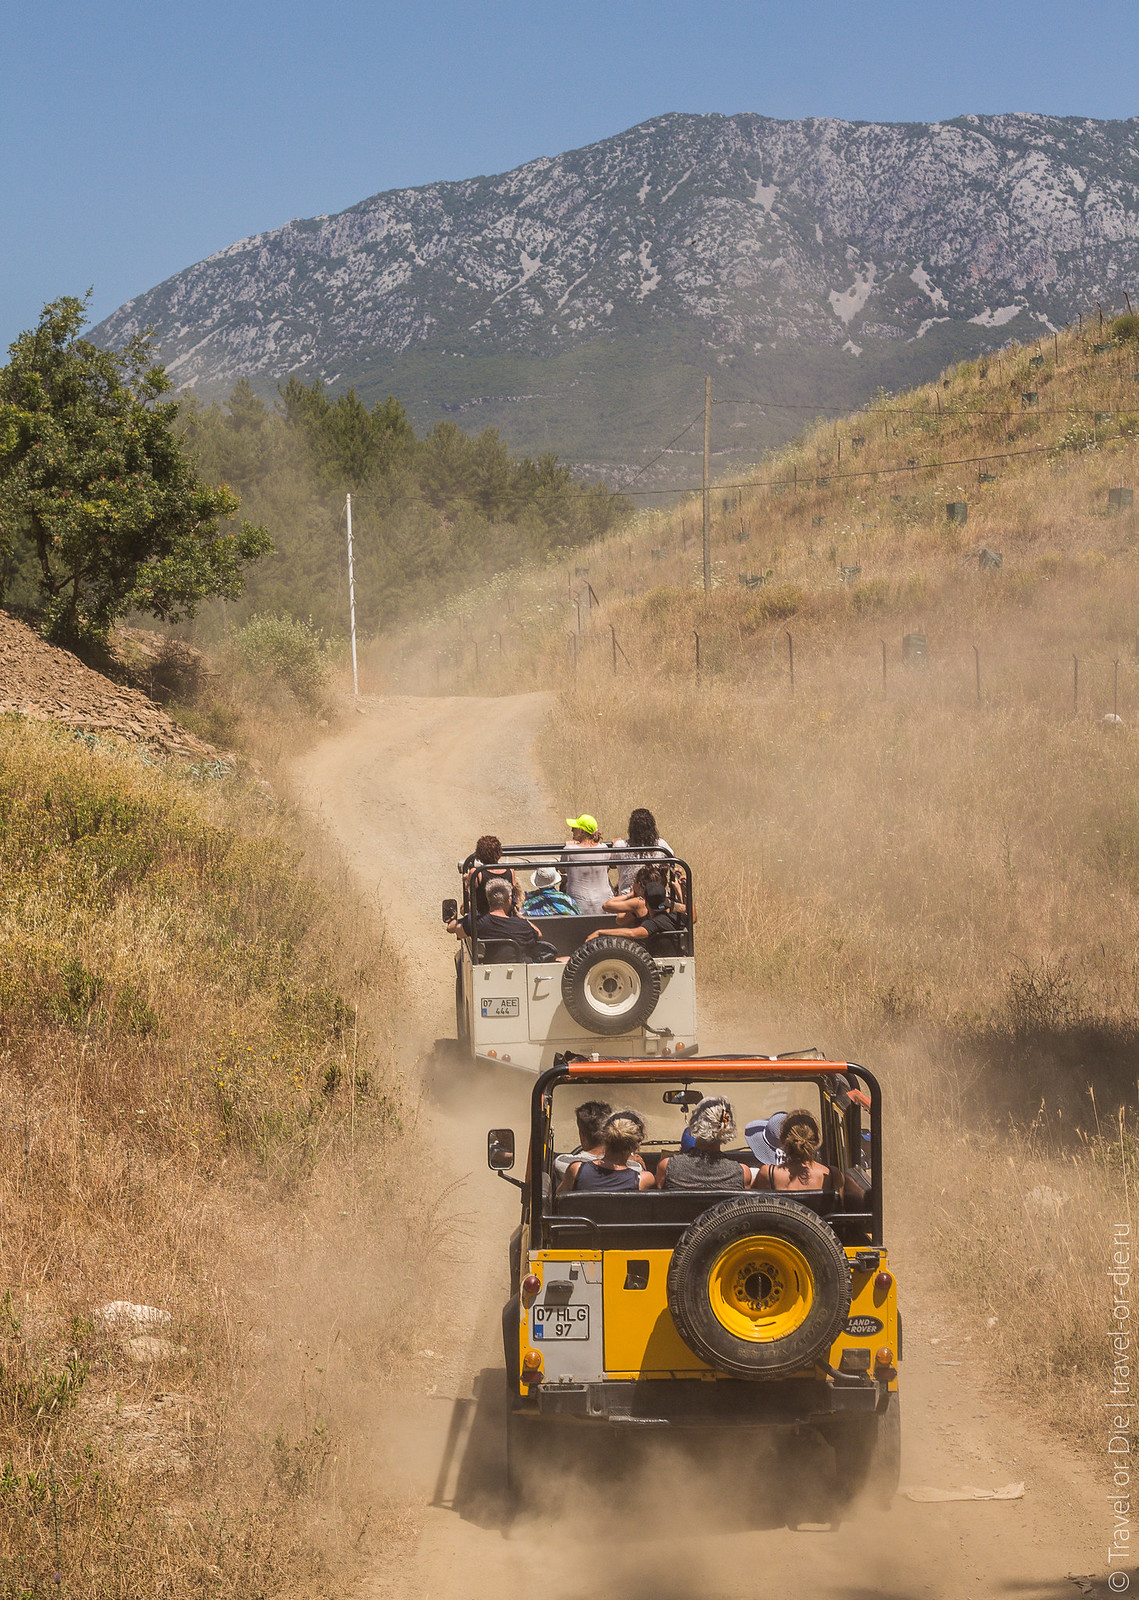 Sapadere-Canyon-Tour-экскурсия-в-каньон-сападере-6130